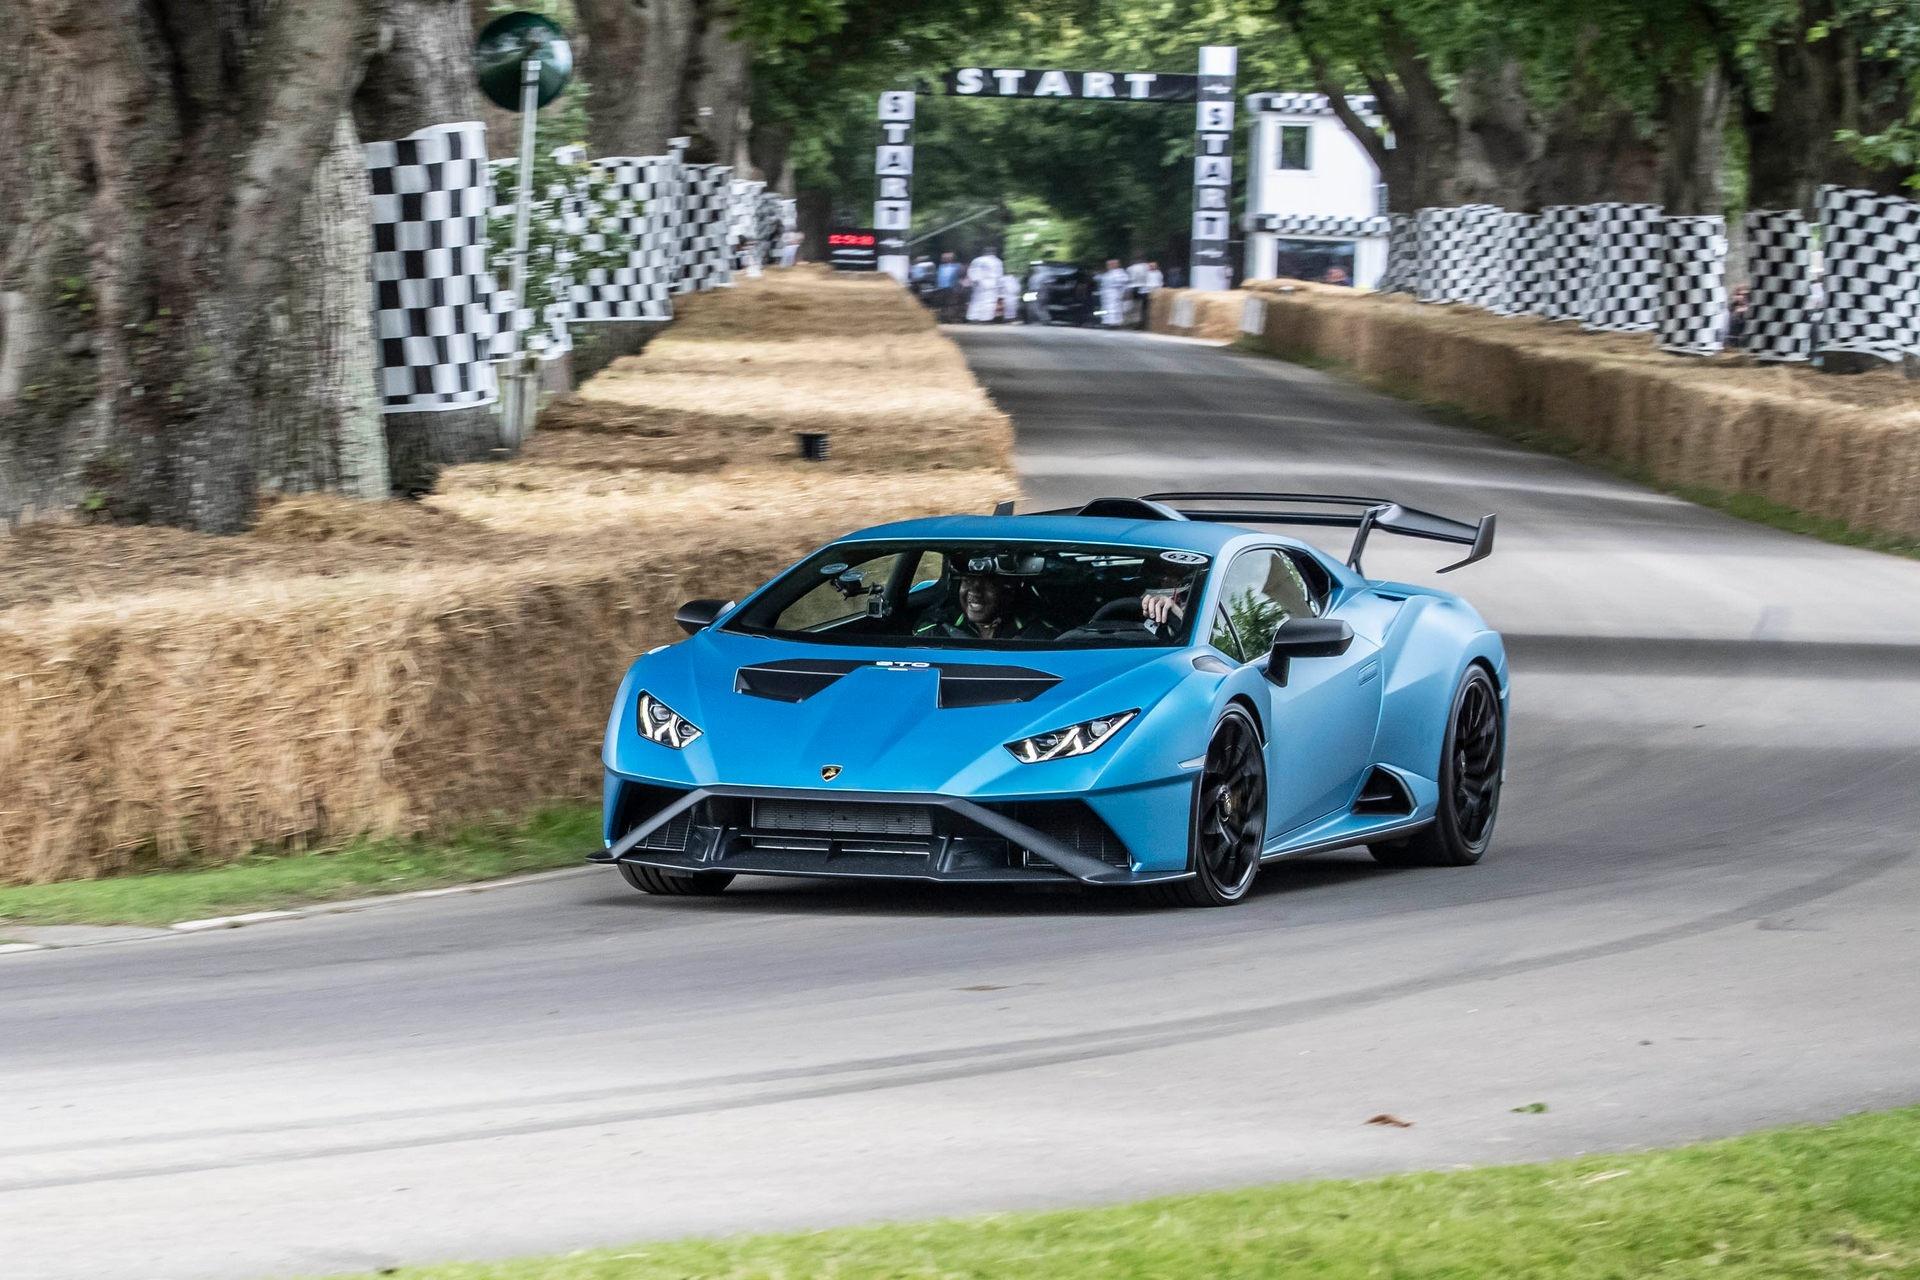 Nhung sieu xe noi bat tai Goodwood Festival of Speed 2021 anh 43